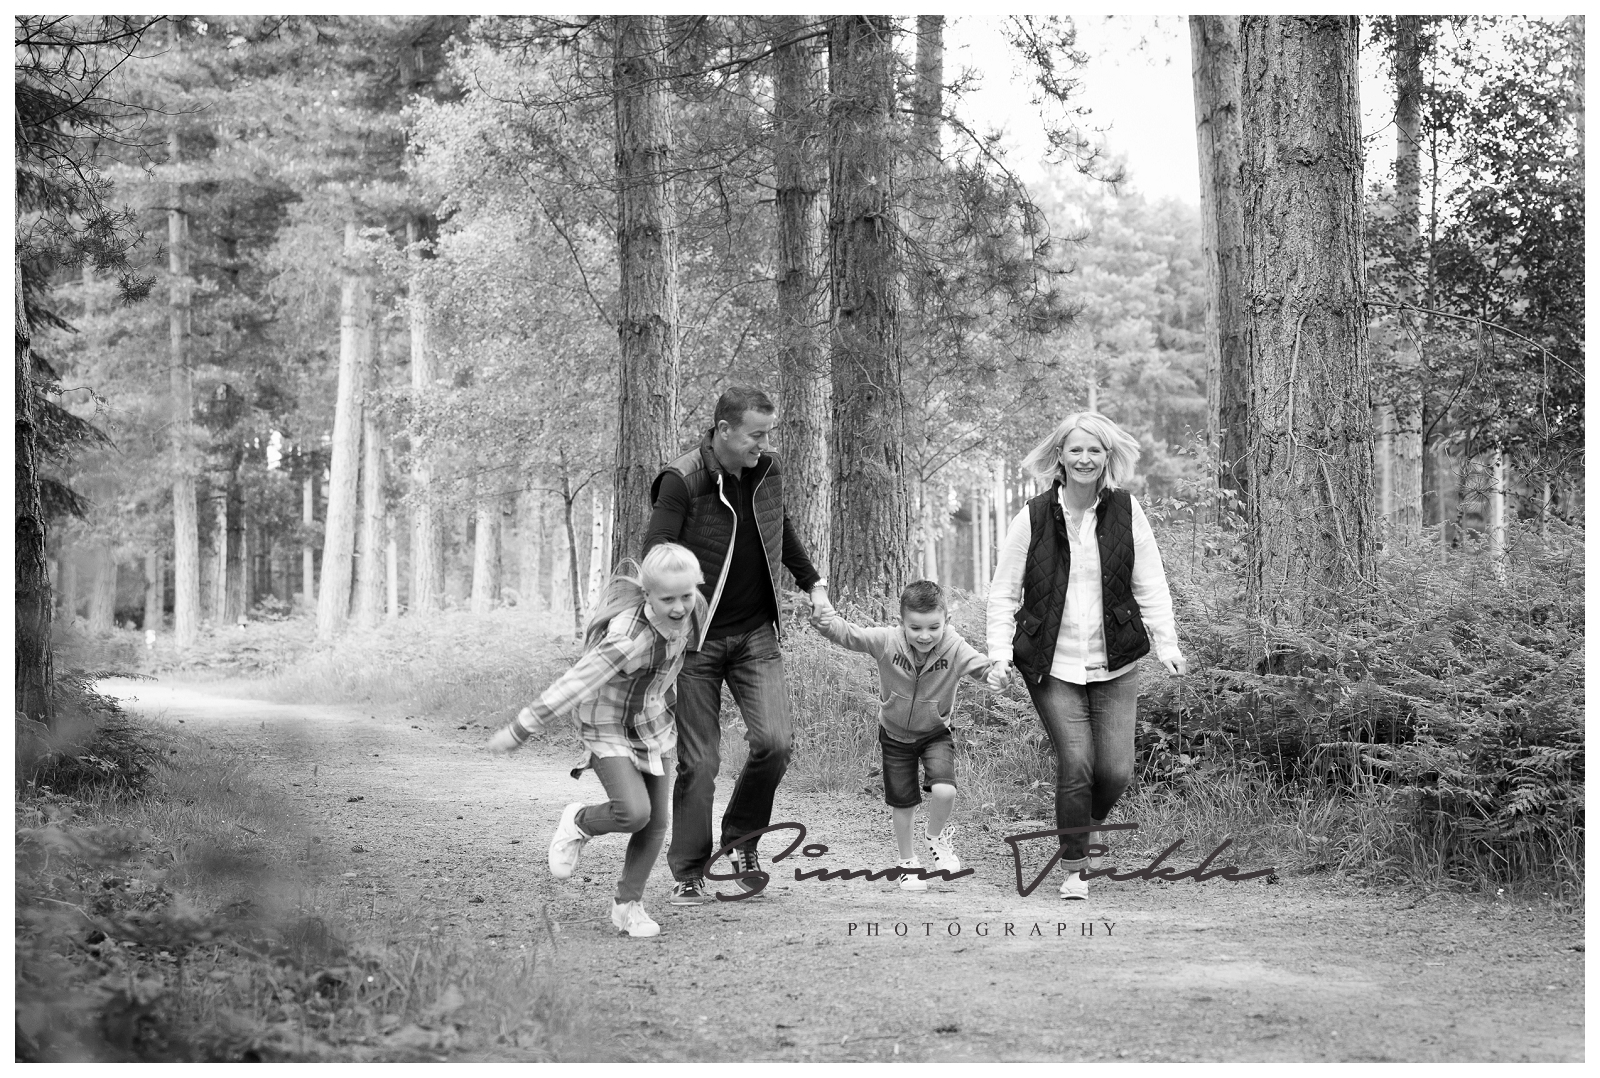 family-run-through-forest-nottingham-photoshoot